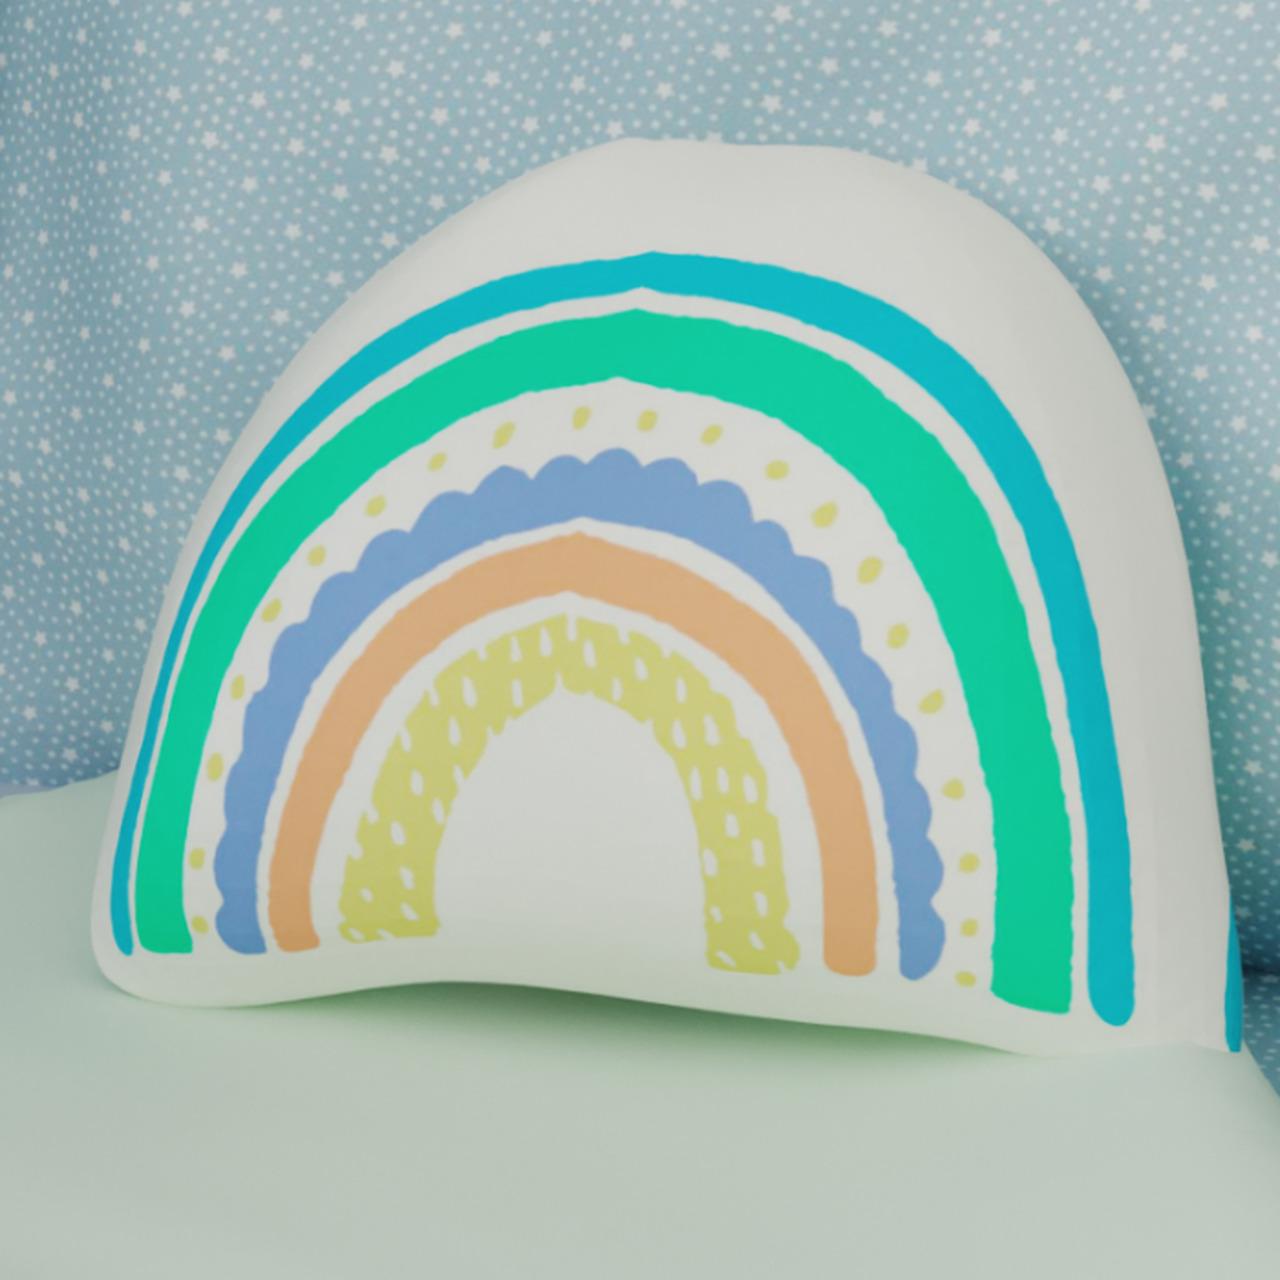 Almofada infantil toy arco íris green